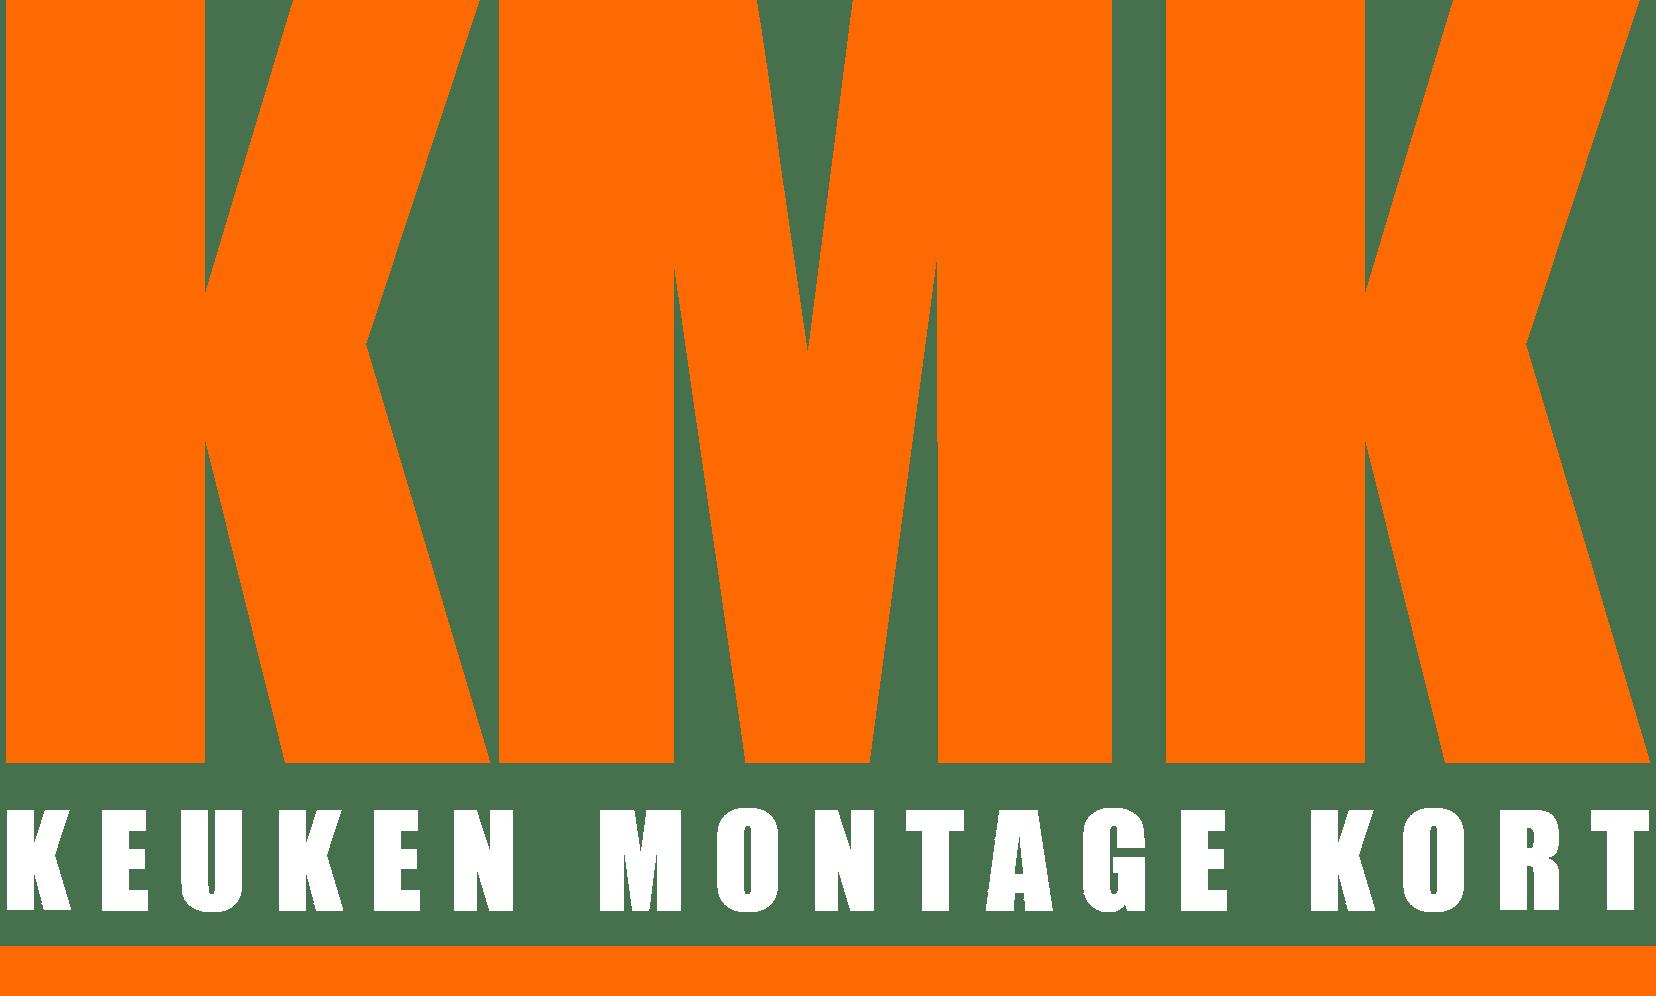 Keuken Montage Kort